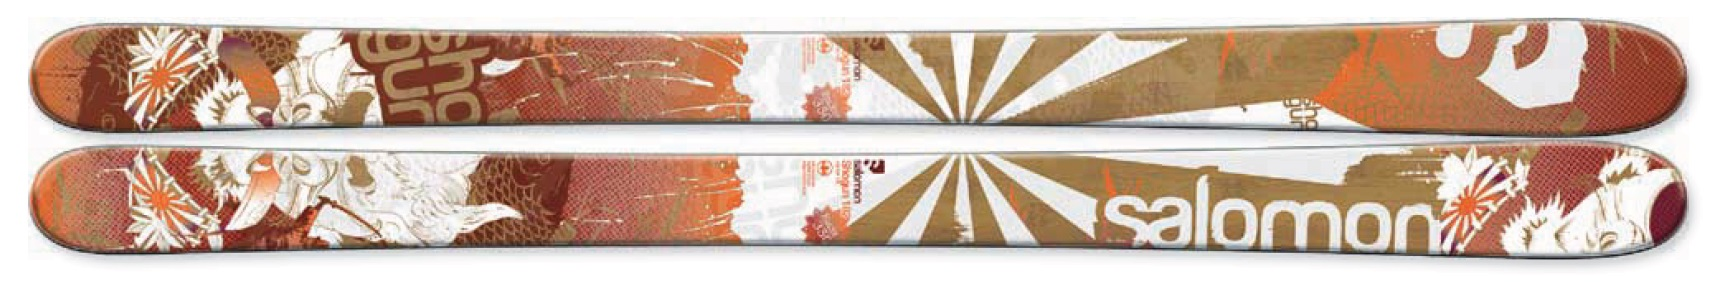 SALOMON Shogun 2012